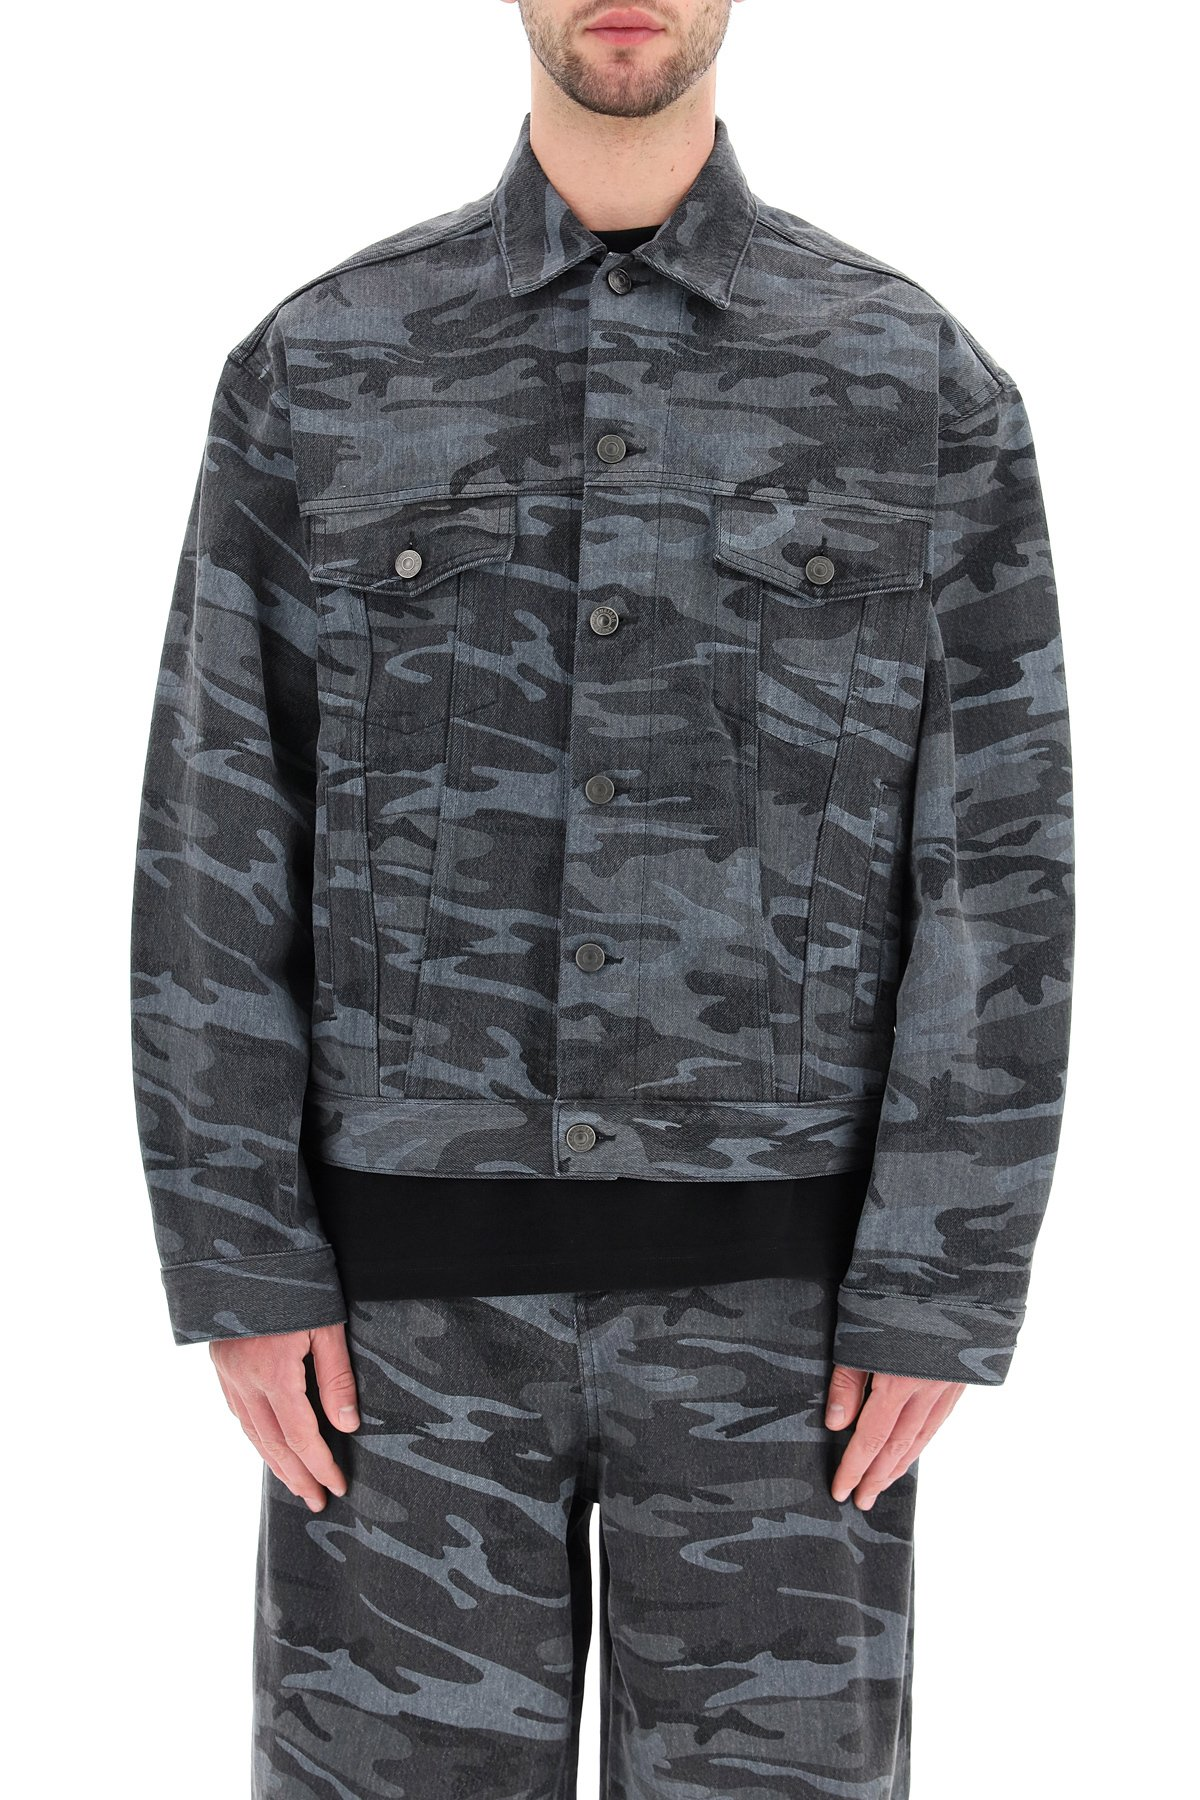 Balenciaga giacca camouflage in denim